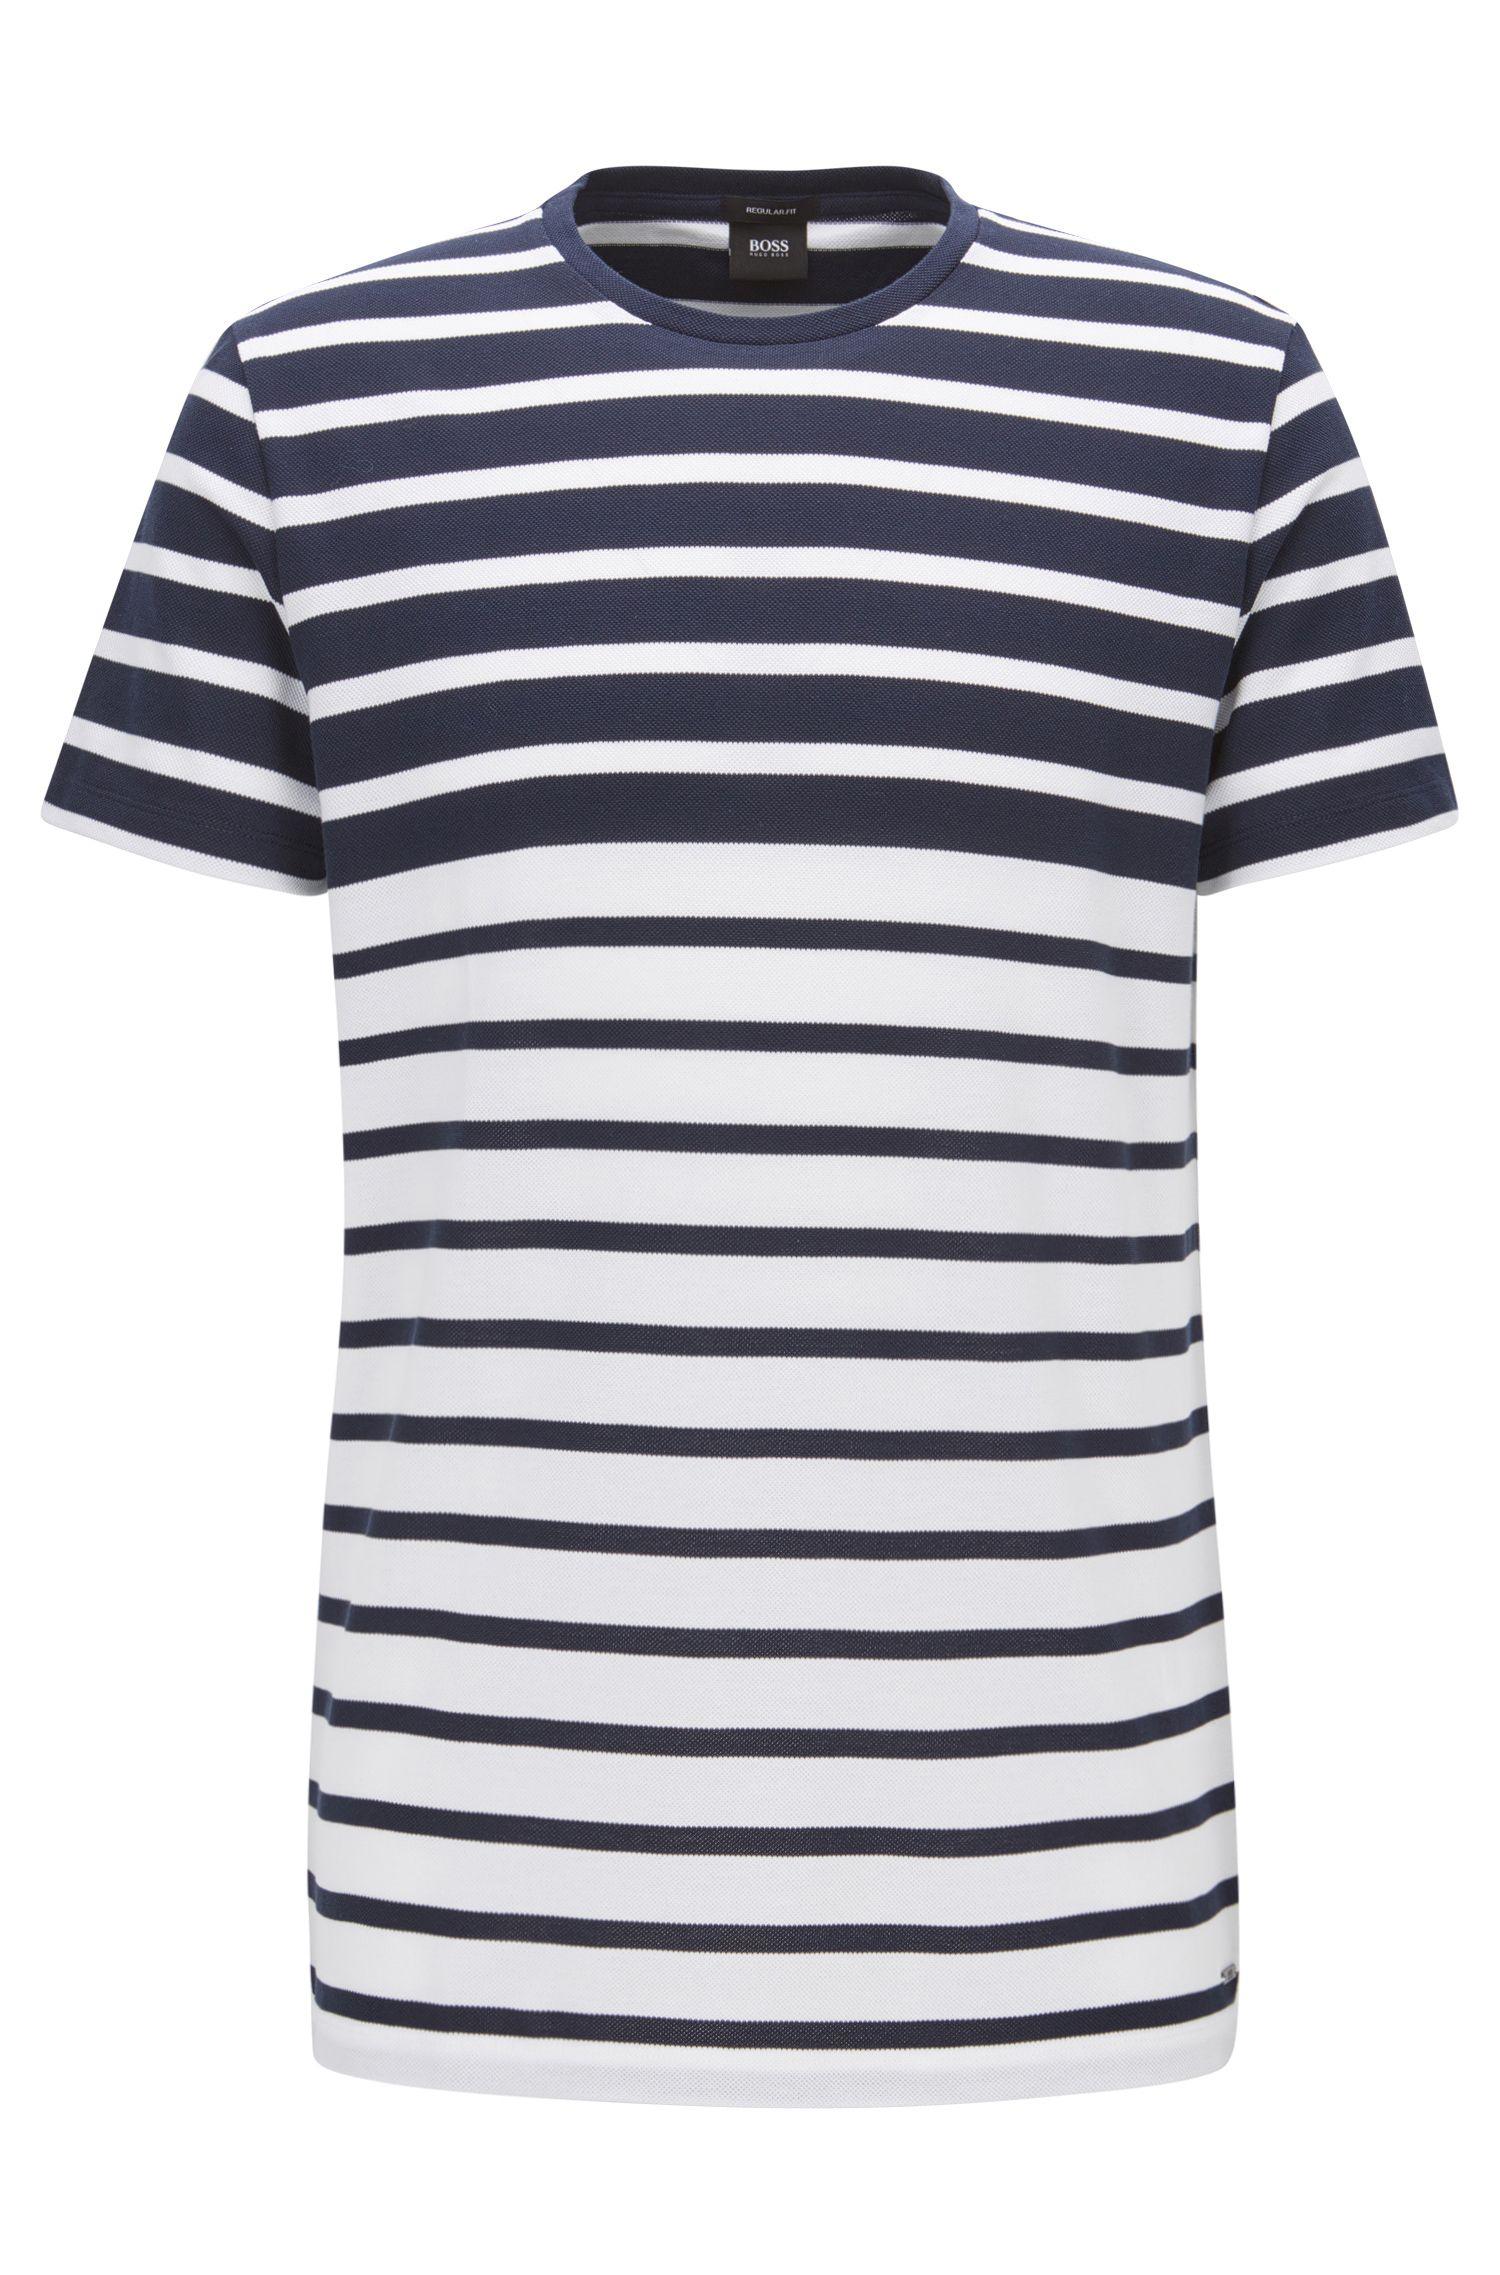 Camiseta regular fit en algodón de piqué a rayas